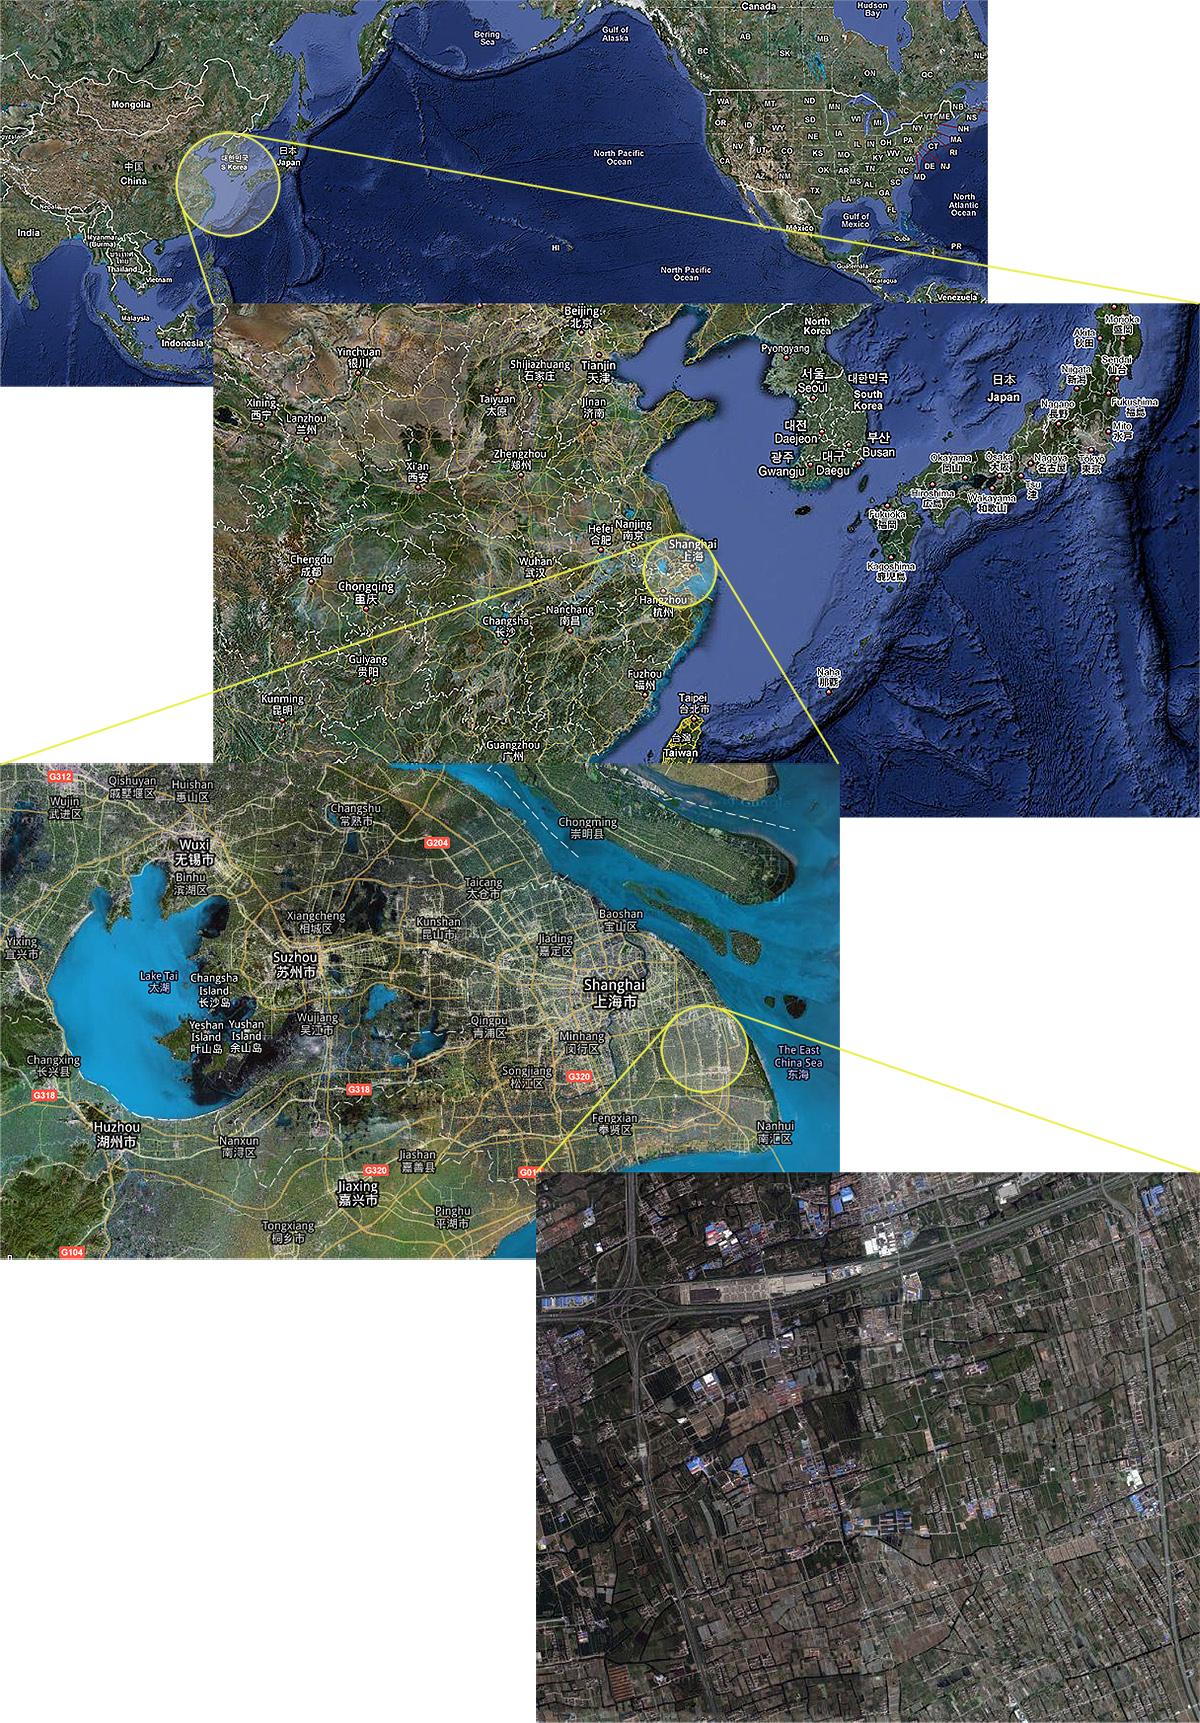 Disneyland Usa Map.Obama S Shanghai Surprise Progress City U S A